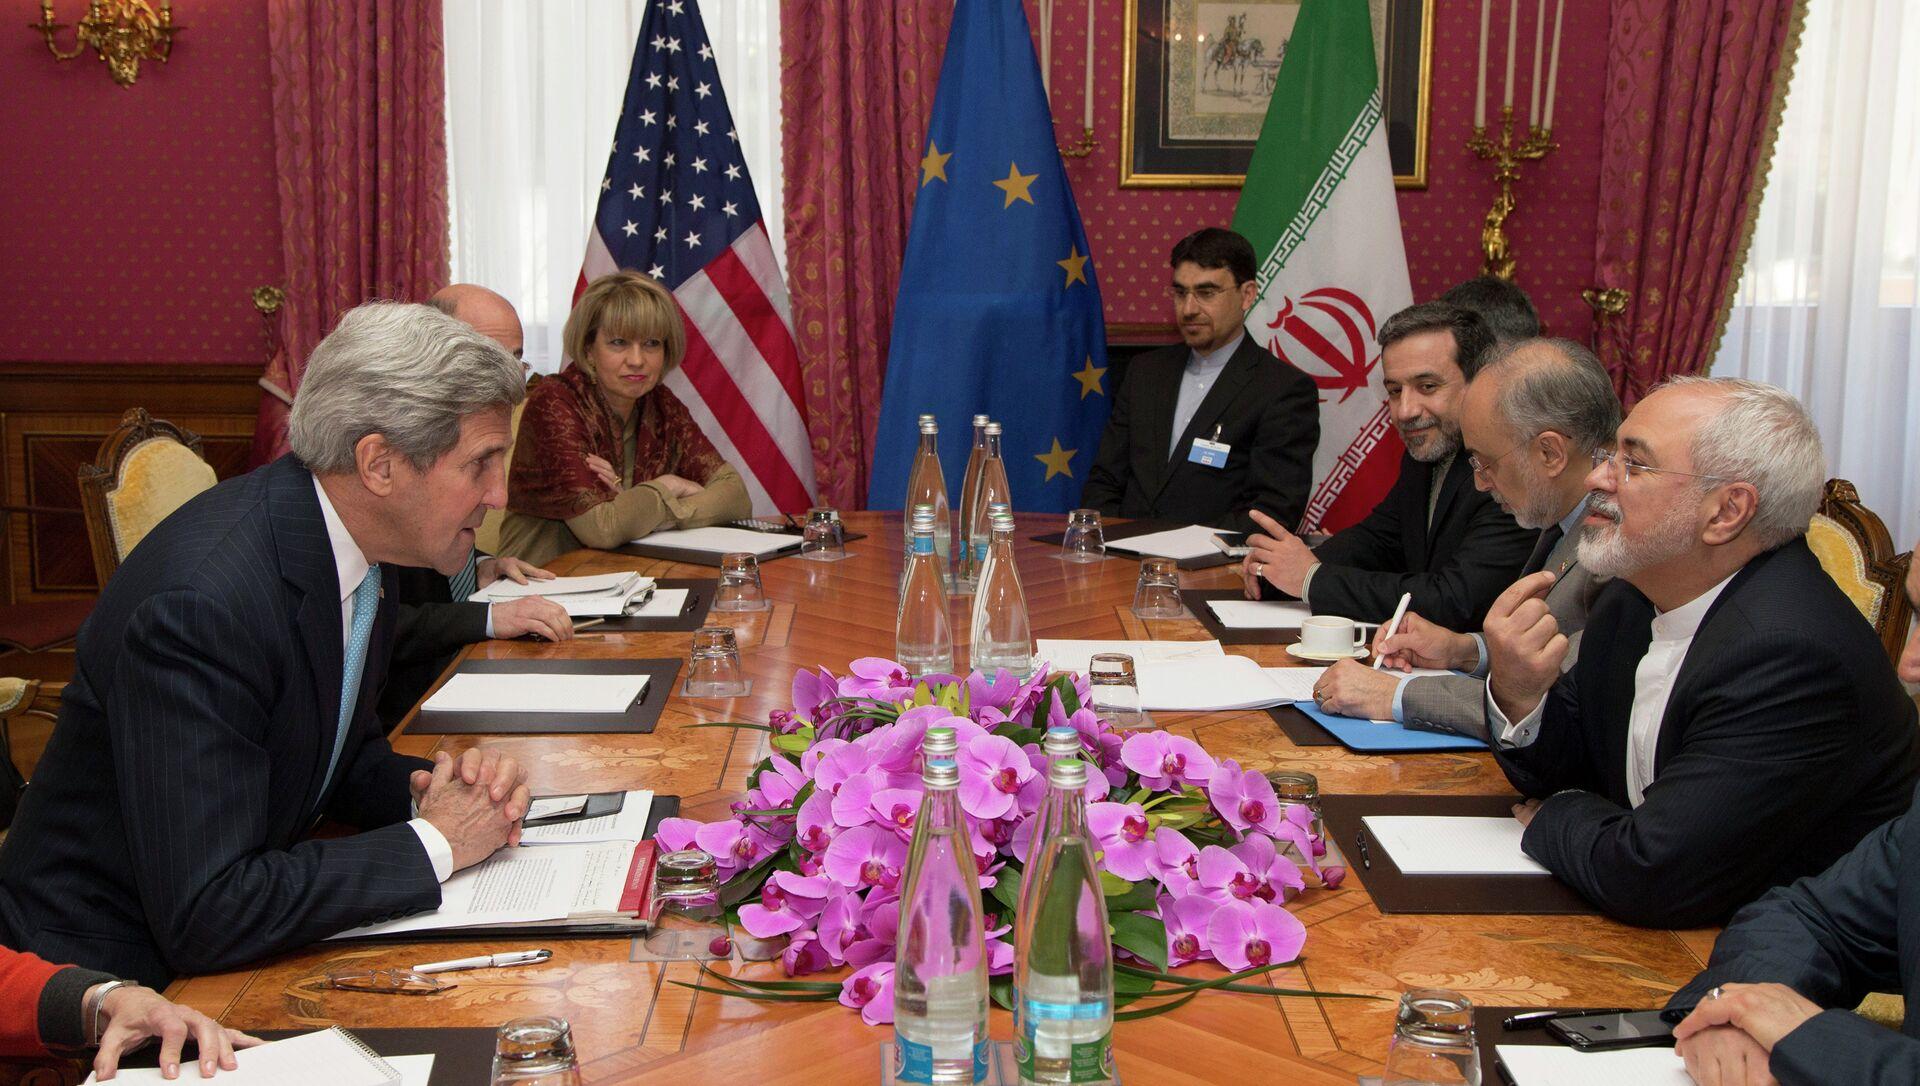 Negoziati su nucleare iraniano - Sputnik Italia, 1920, 05.04.2021